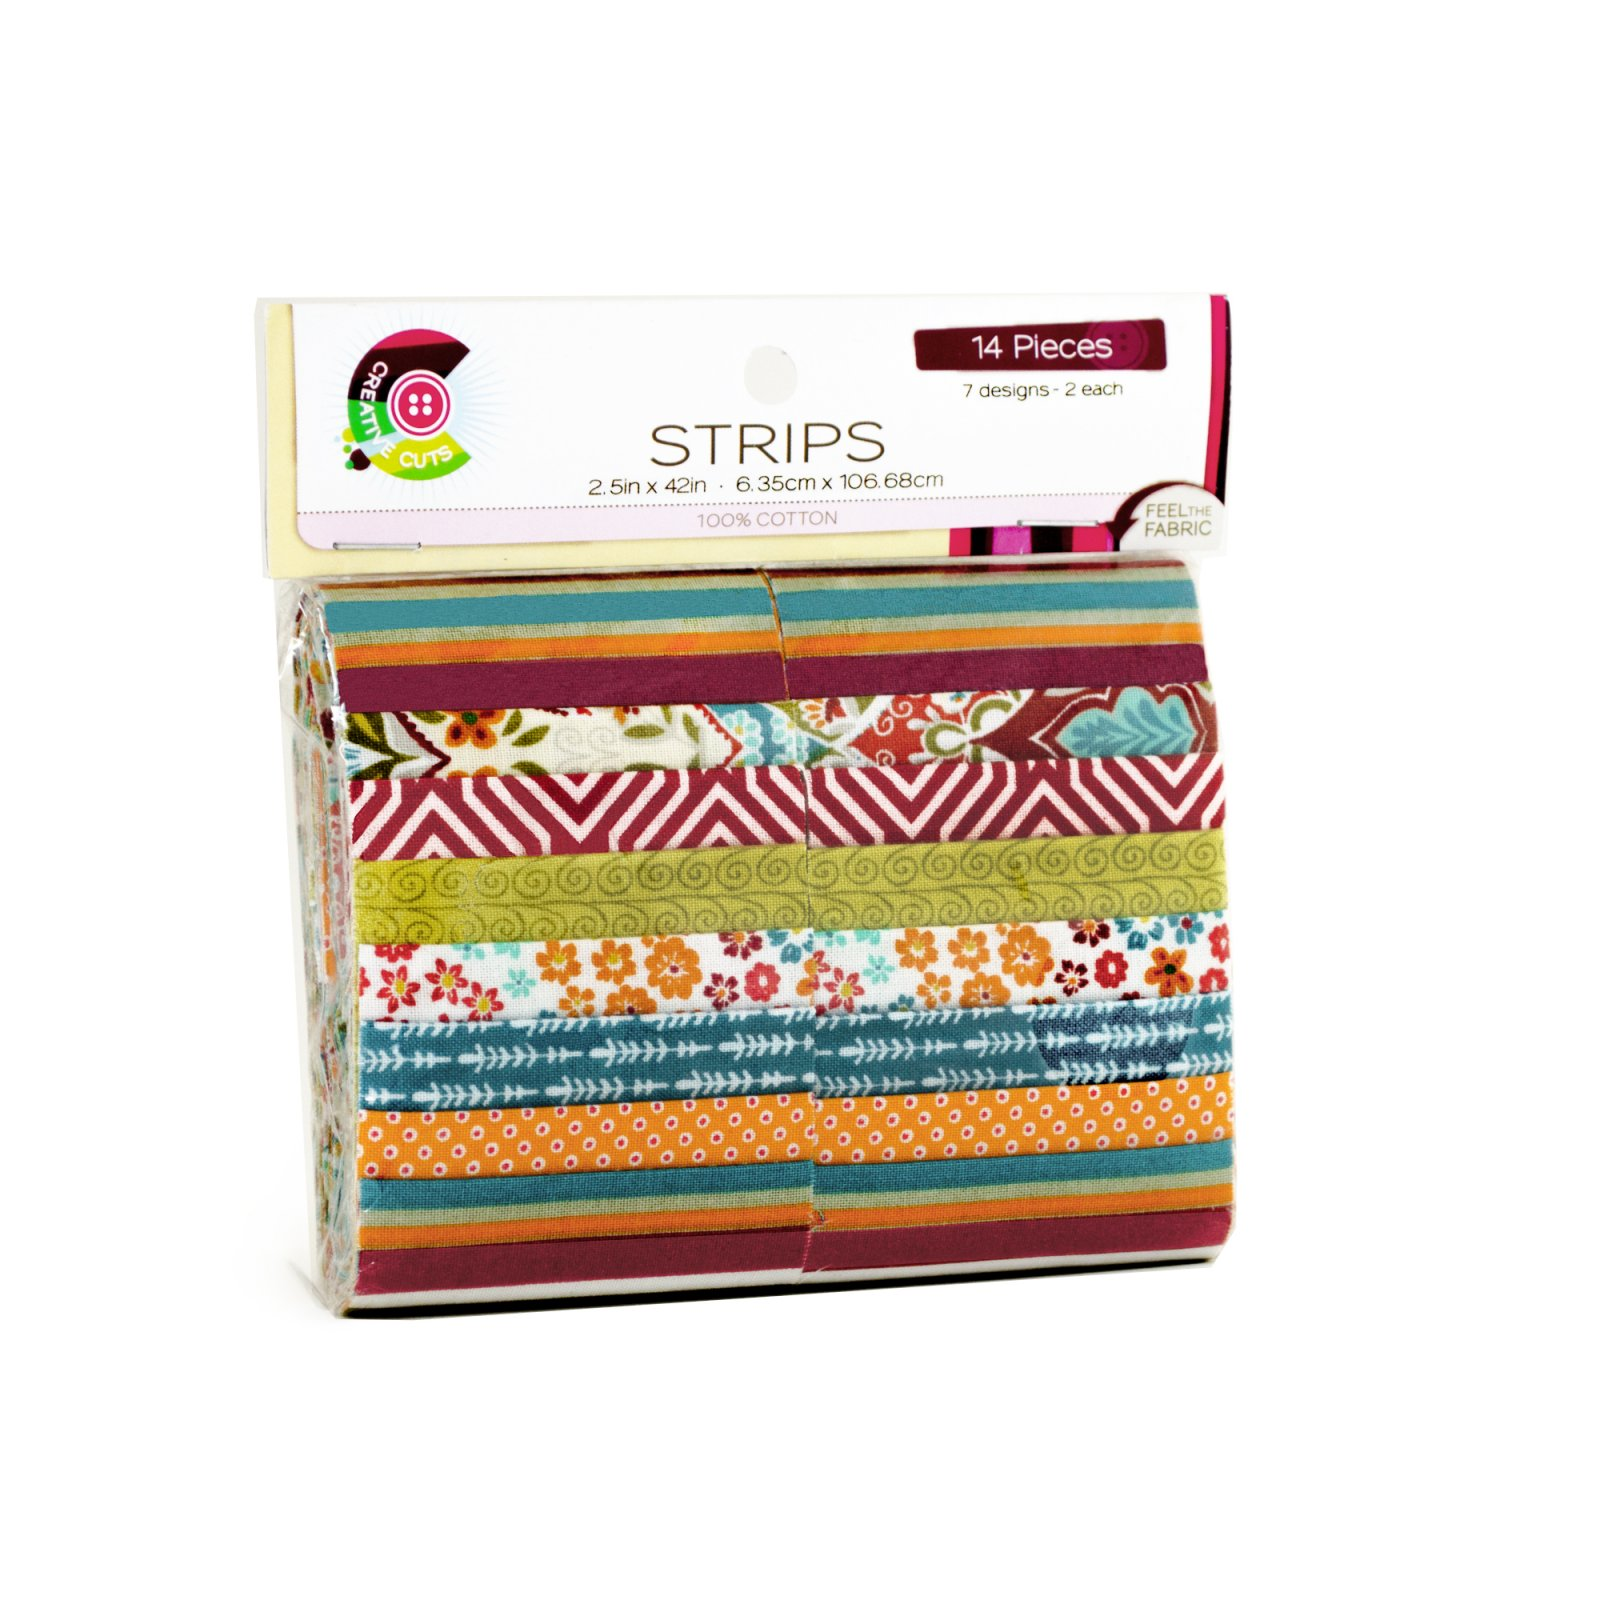 Creative Cuts 14pc Strips Roll<br>Jahandar Collection<br>MD-WM-STR-JAH